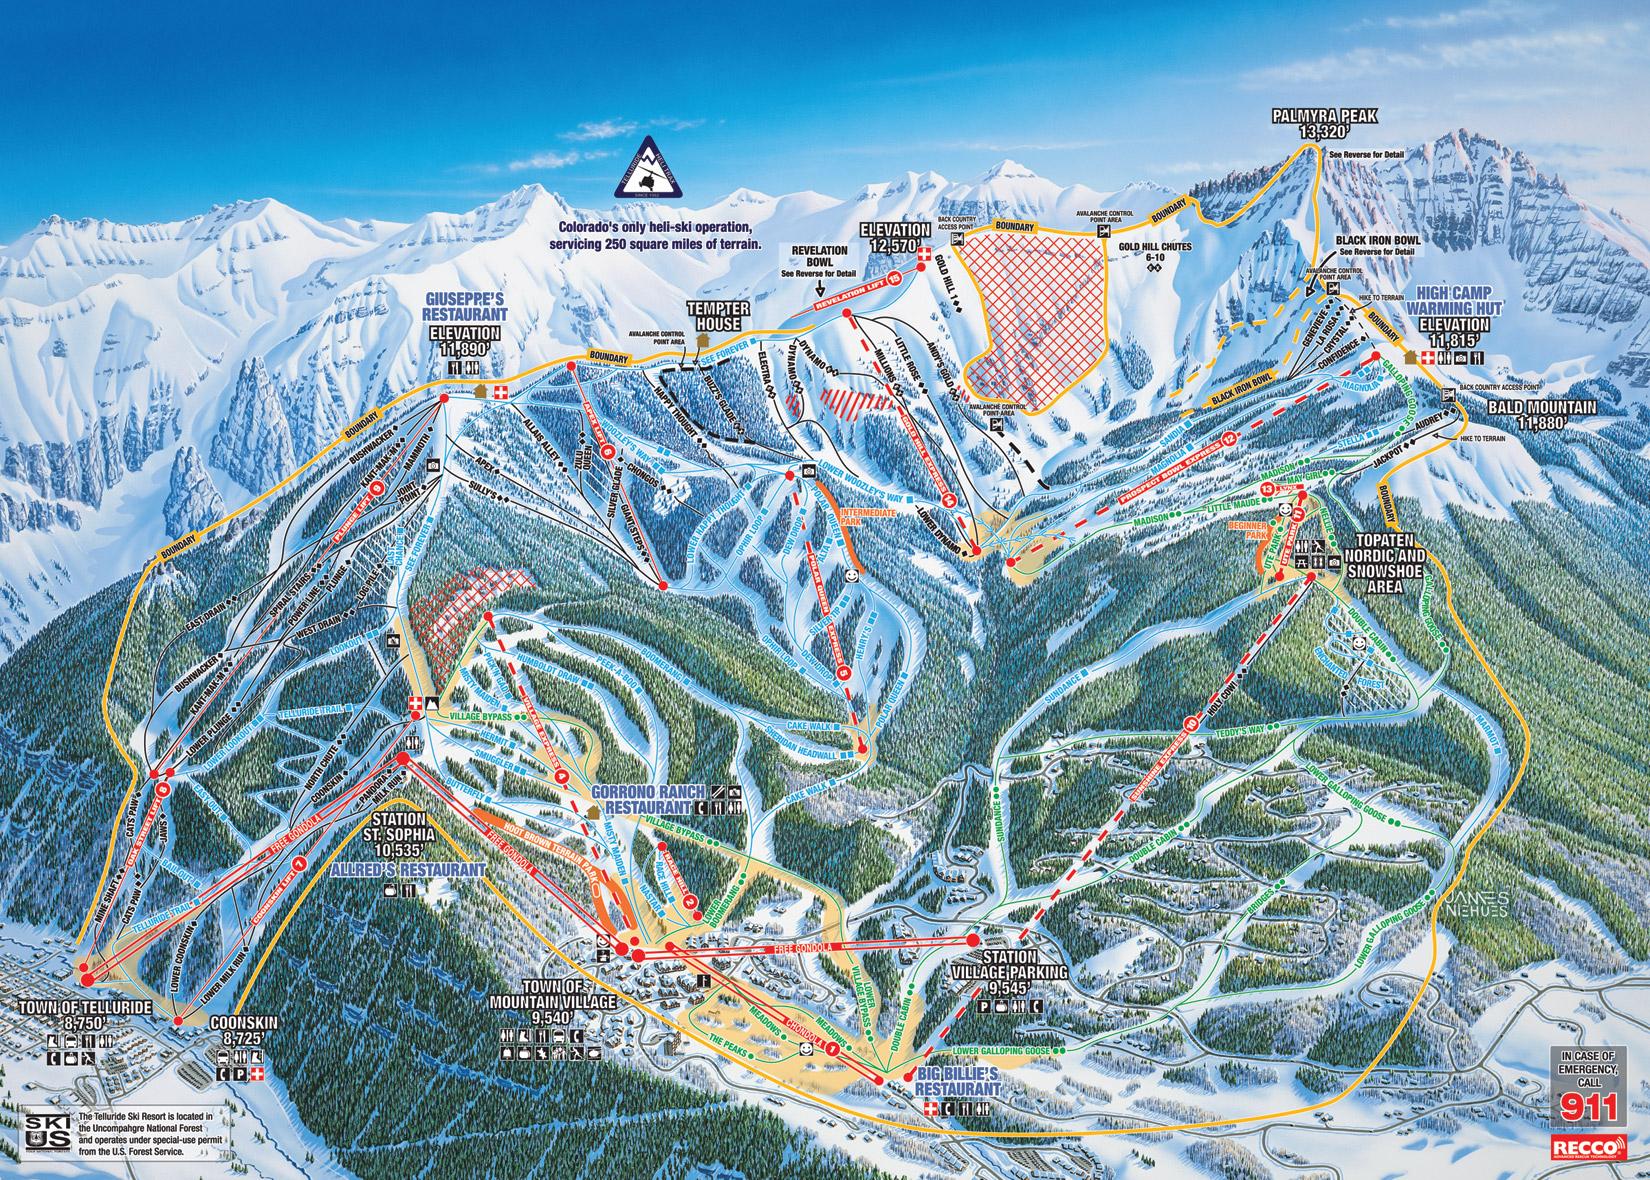 Telluride Ski Resort Ranks 5th Overall Best Ski Resort In